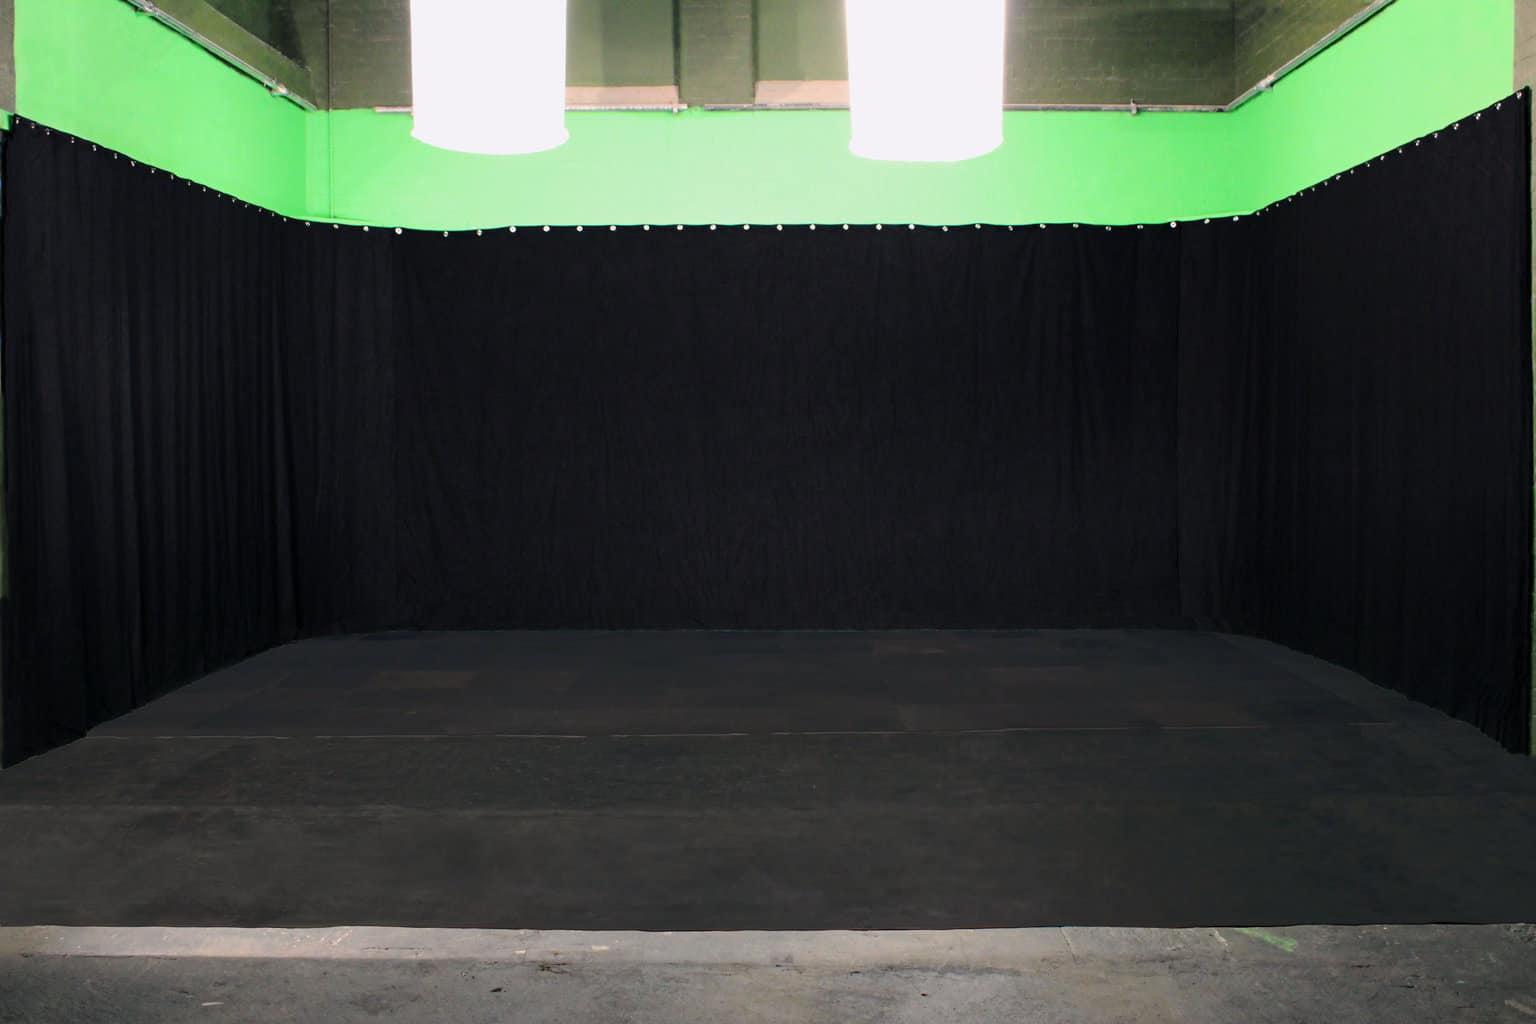 studio space black drapes